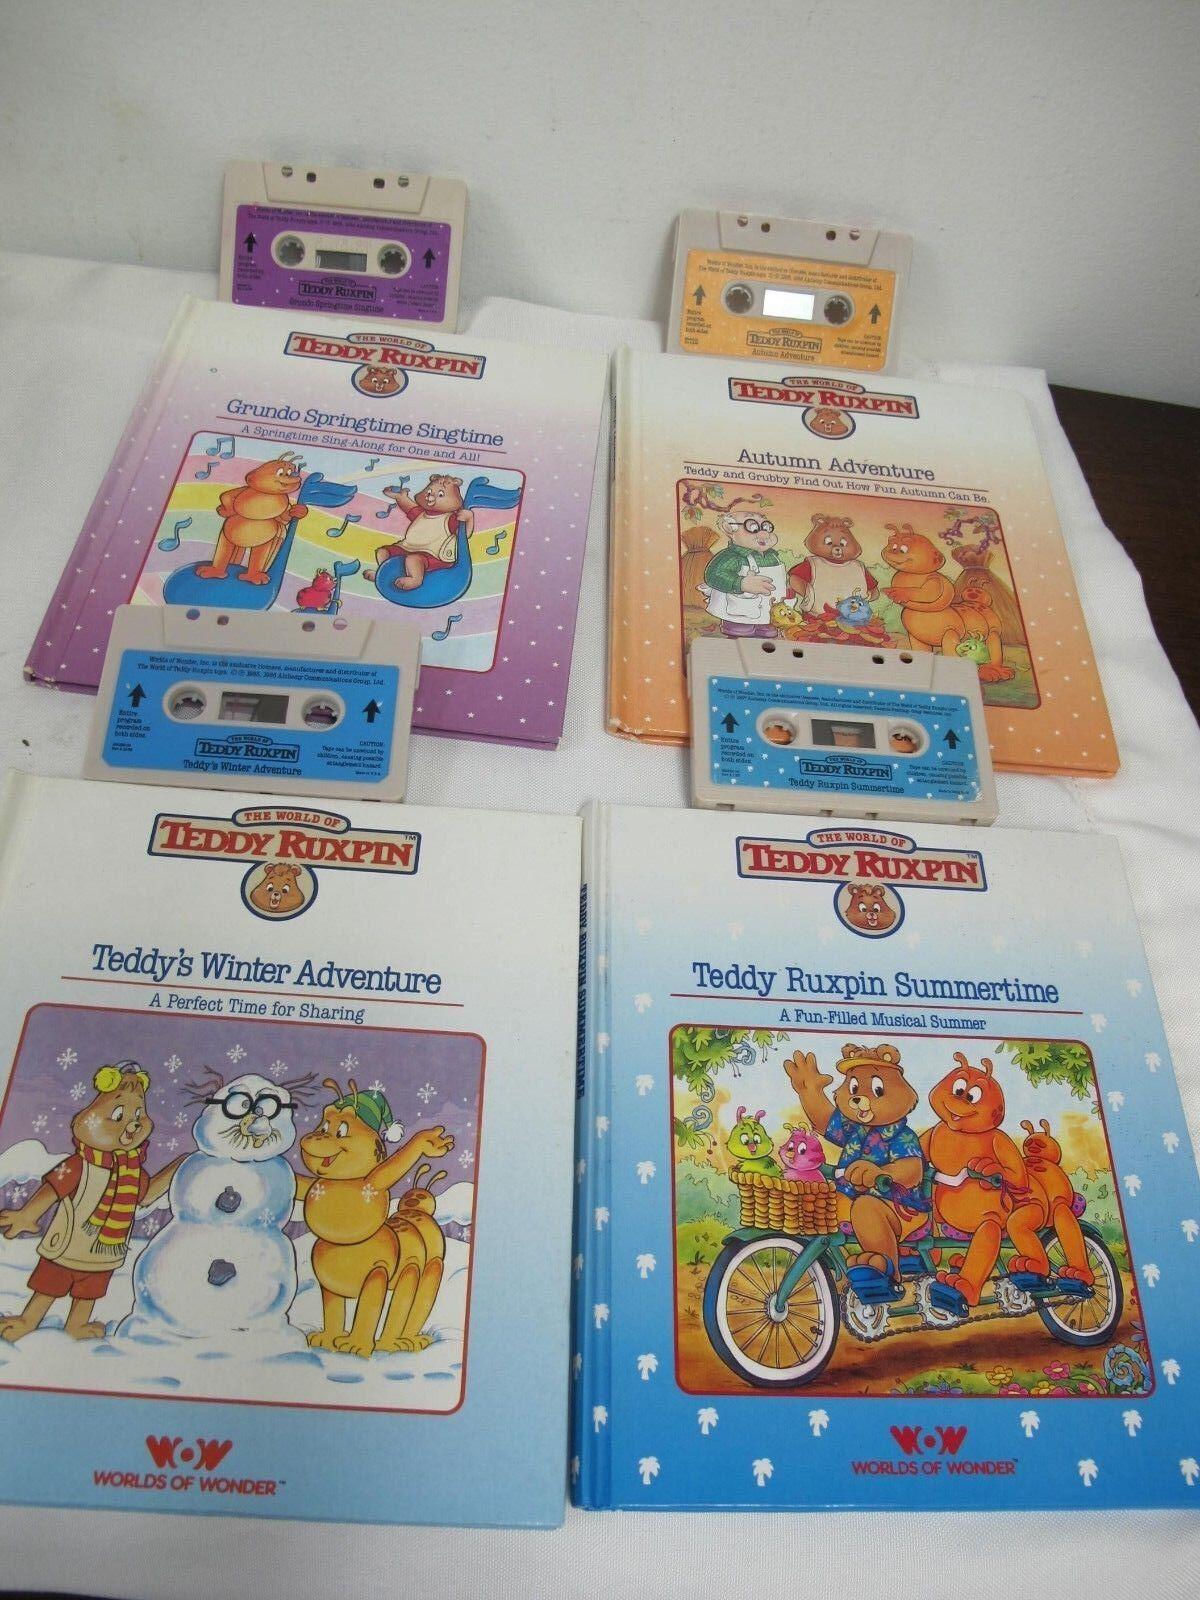 TEDDY RUXPIN BOOKS TAPES SEASONS SUMMERTIME WINTER AUTUMN SPRINGTIME SINGTIME